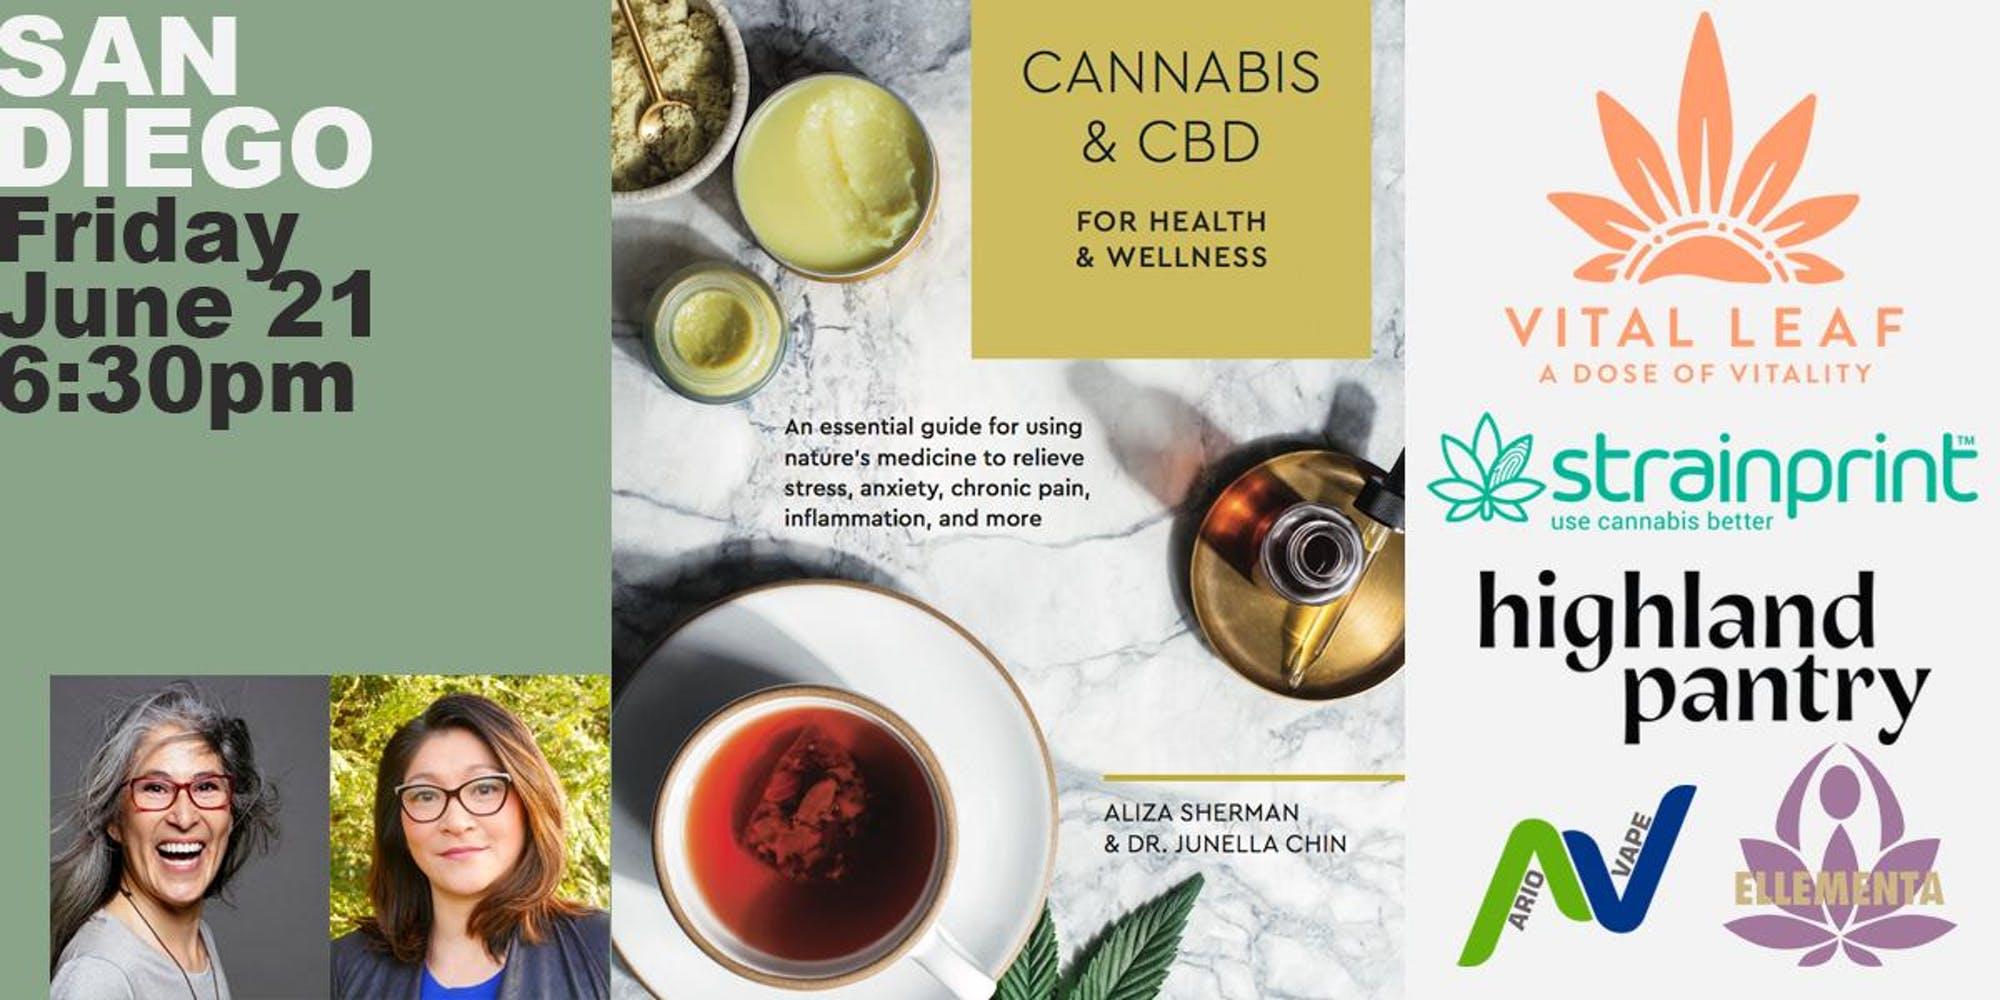 Book Launch Party San Diego: Cannabis & CBD for Health & Wellness